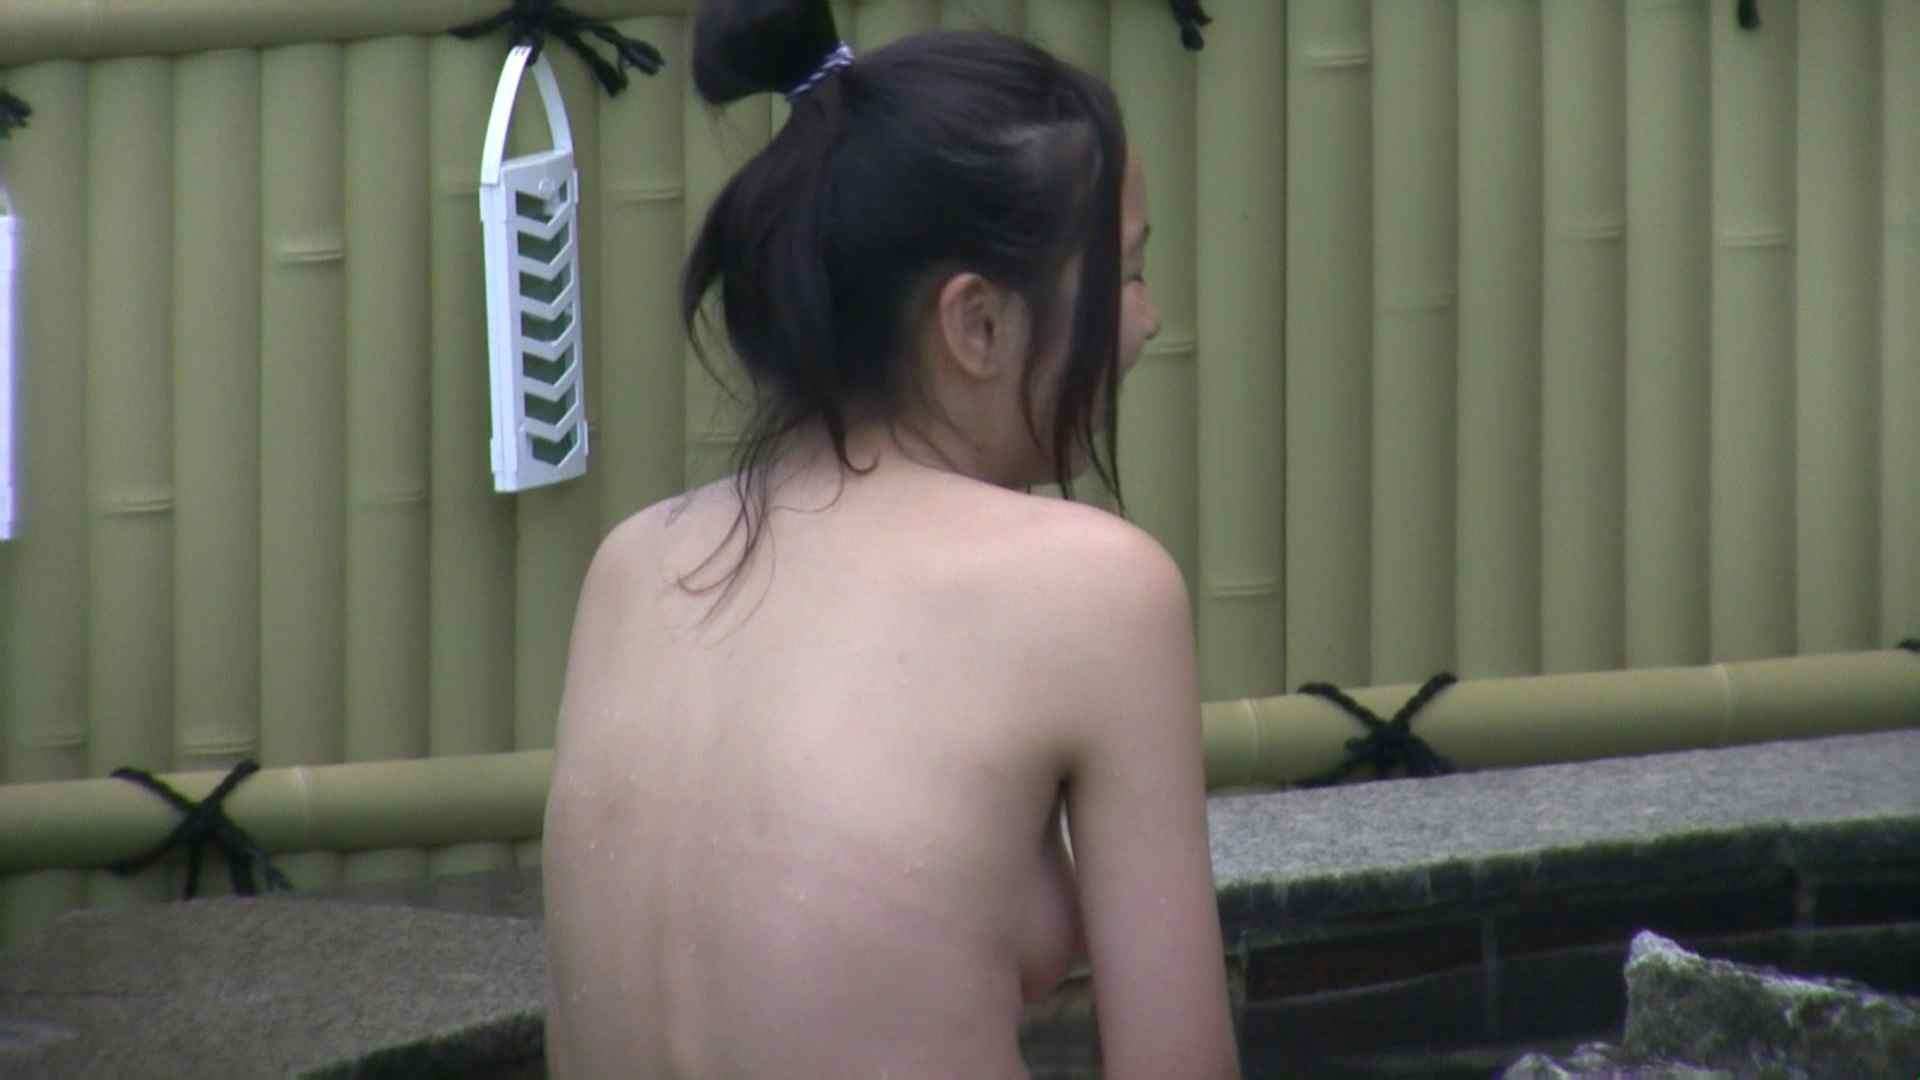 Aquaな露天風呂Vol.87【VIP限定】 盗撮師作品  79pic 6